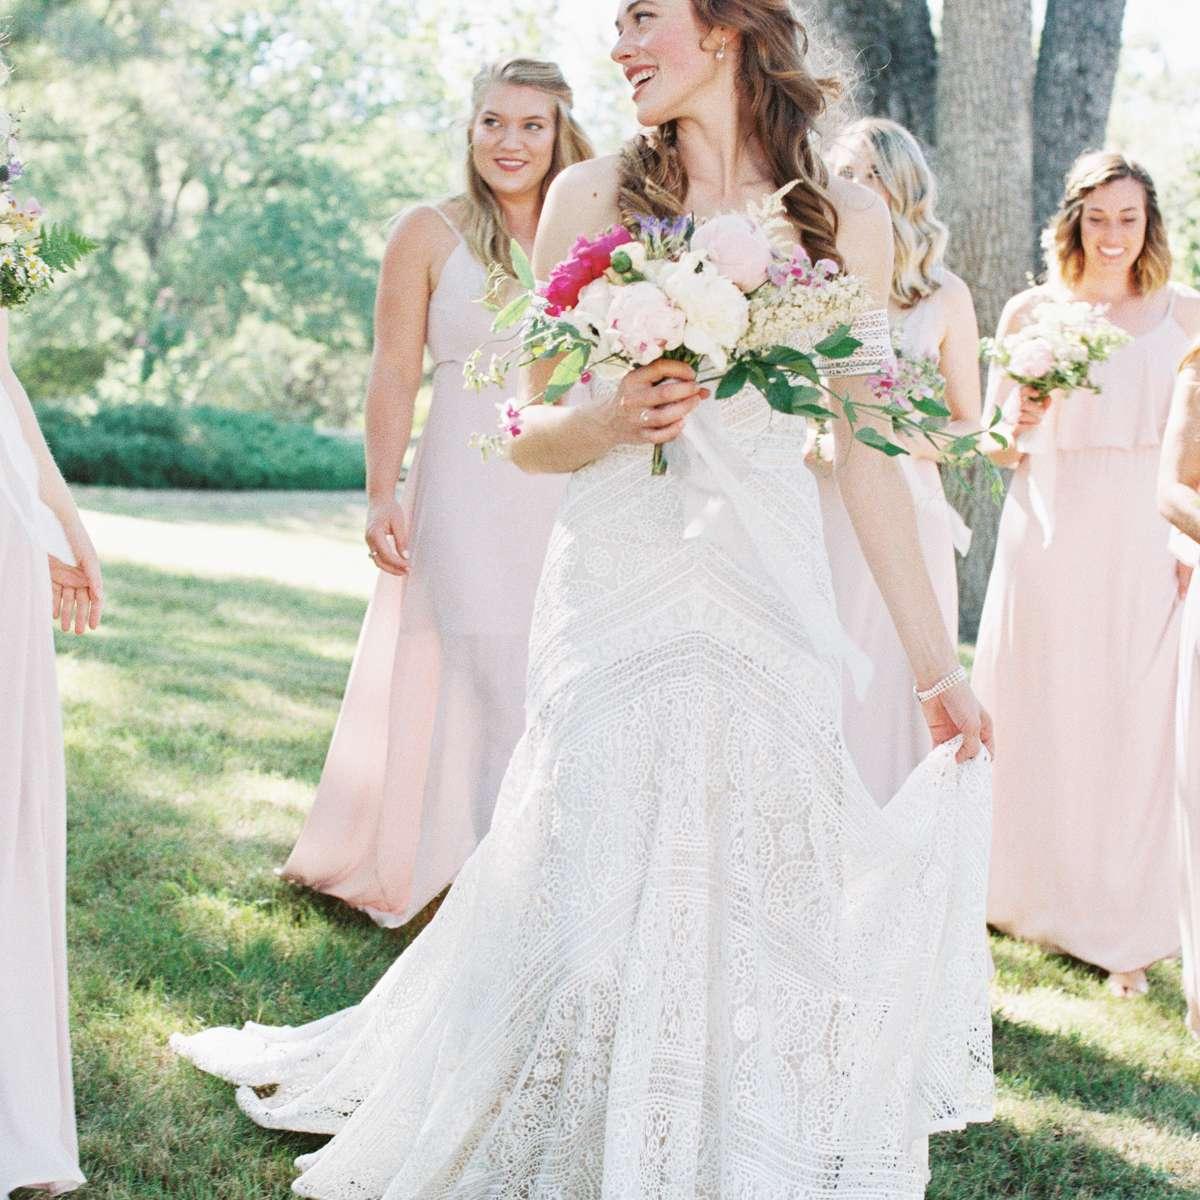 bride wedding dress with bridesmaids